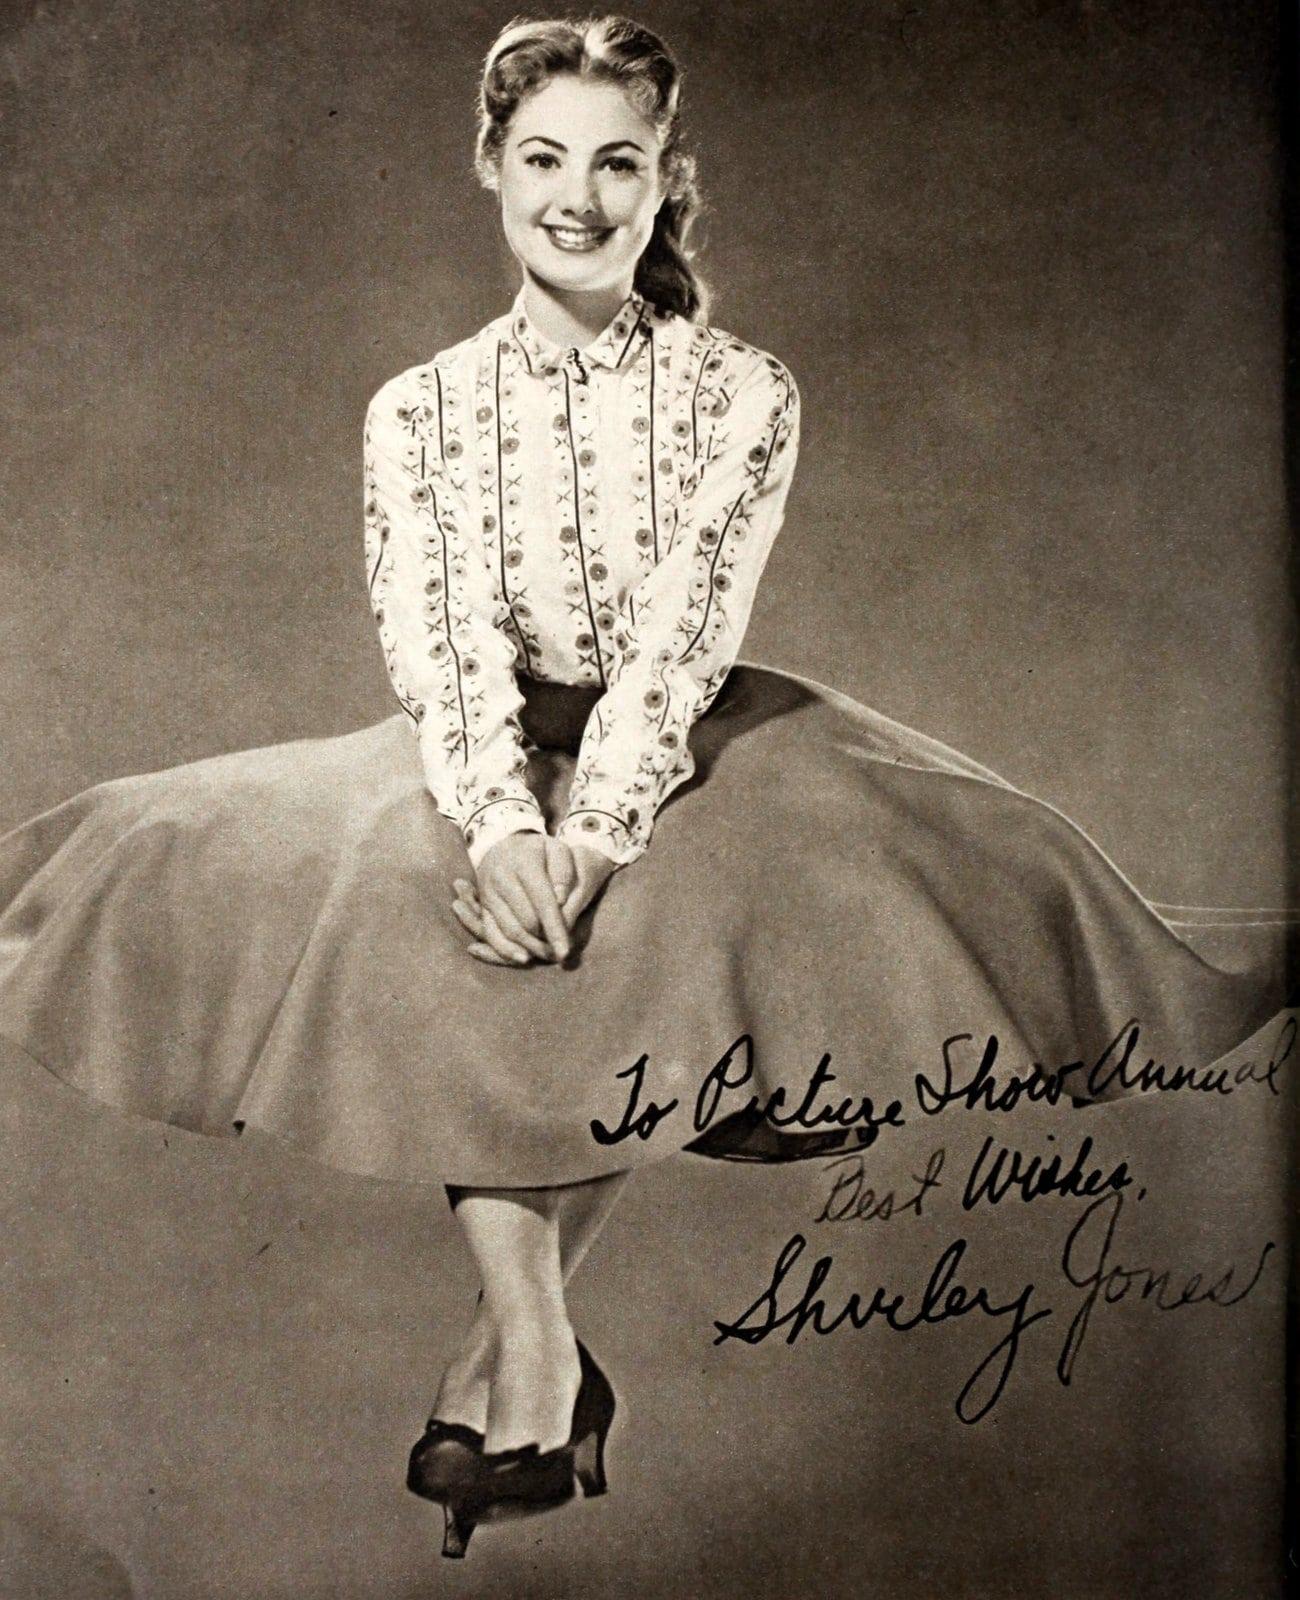 Vintage Shirley Jones autograph (1959)